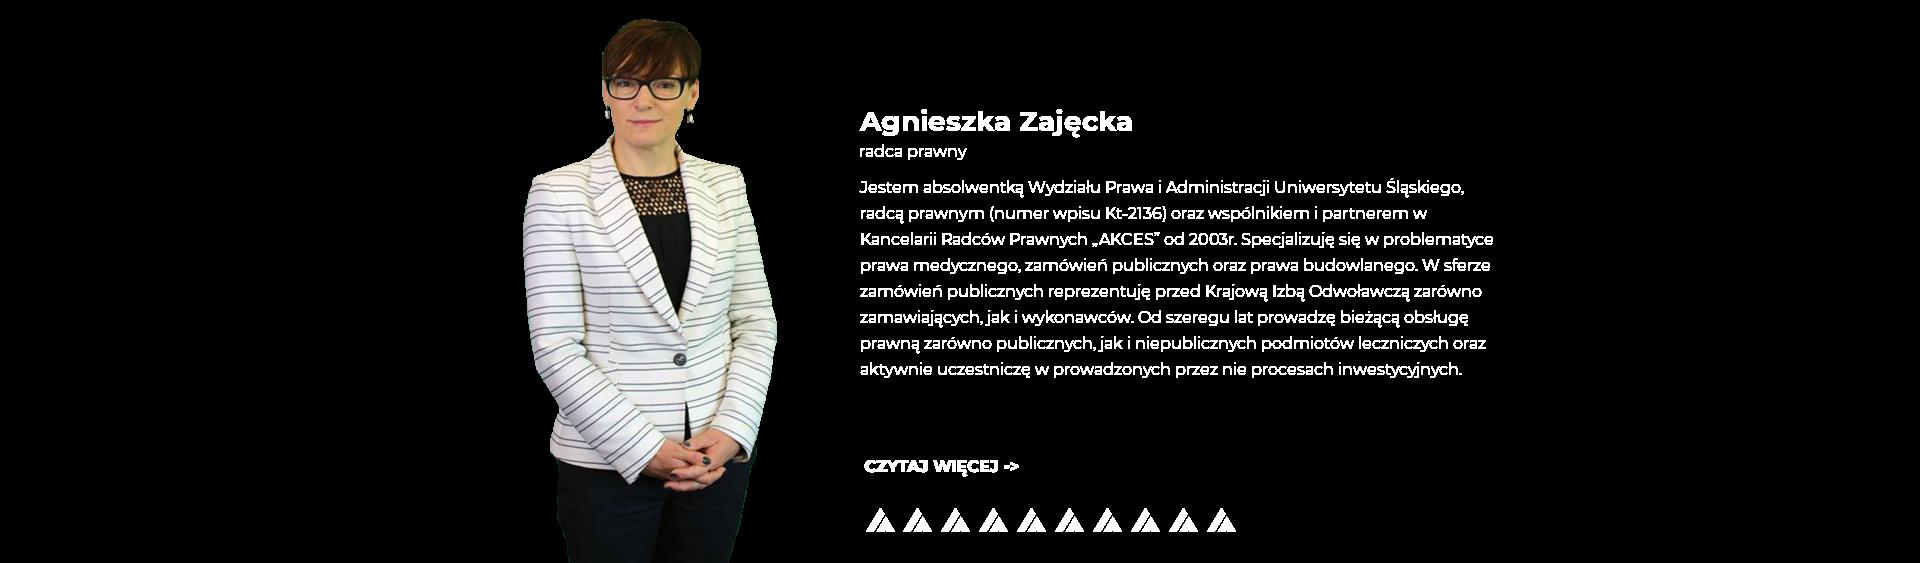 agnieszkaslidePL_2